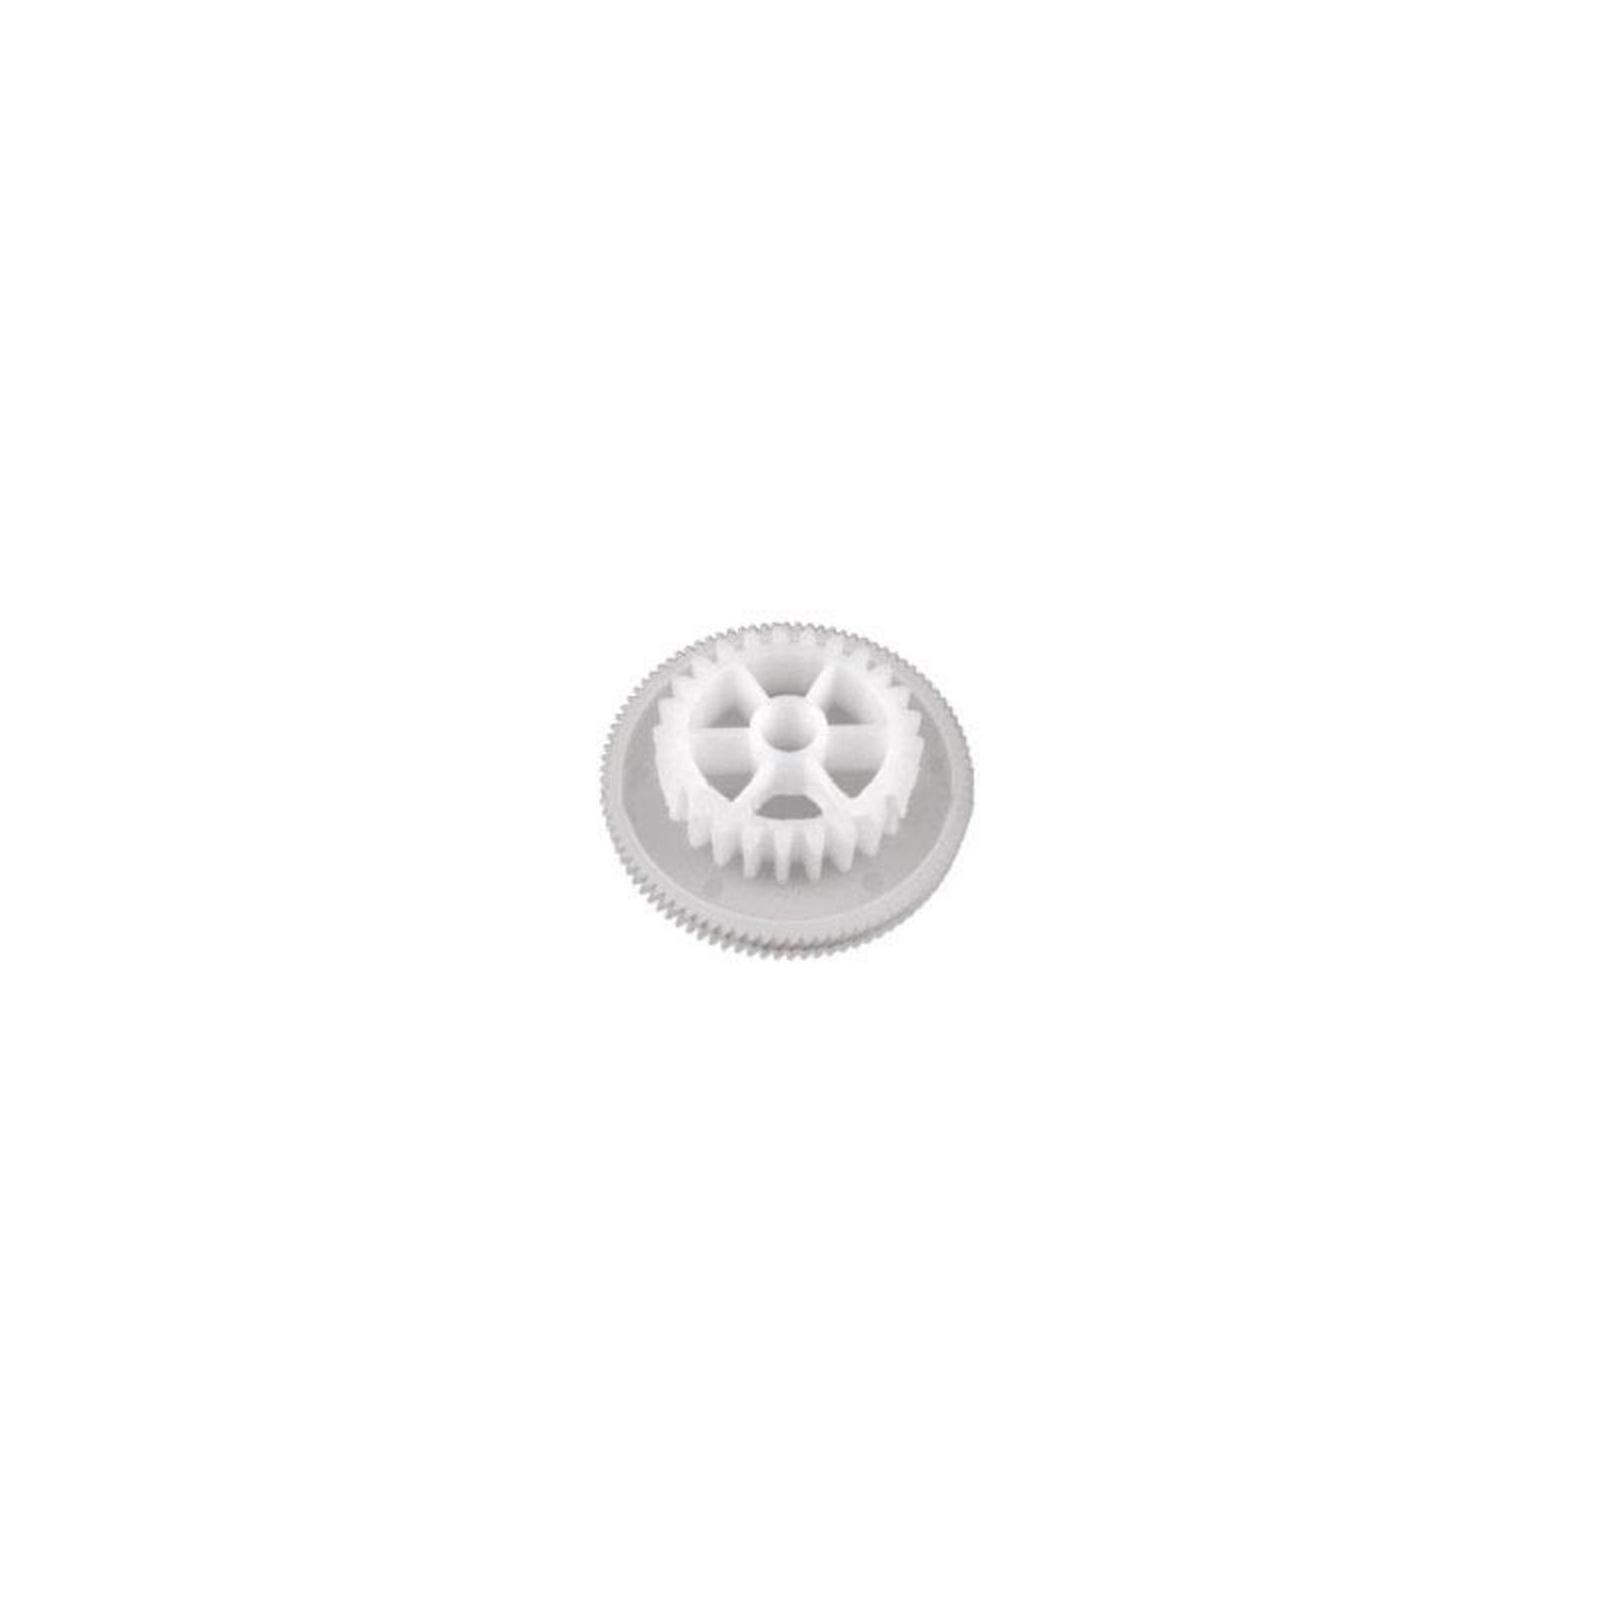 Шестерня привода HP LJ P4014/4015 аналог RU6-0170-000 АНК (22714)